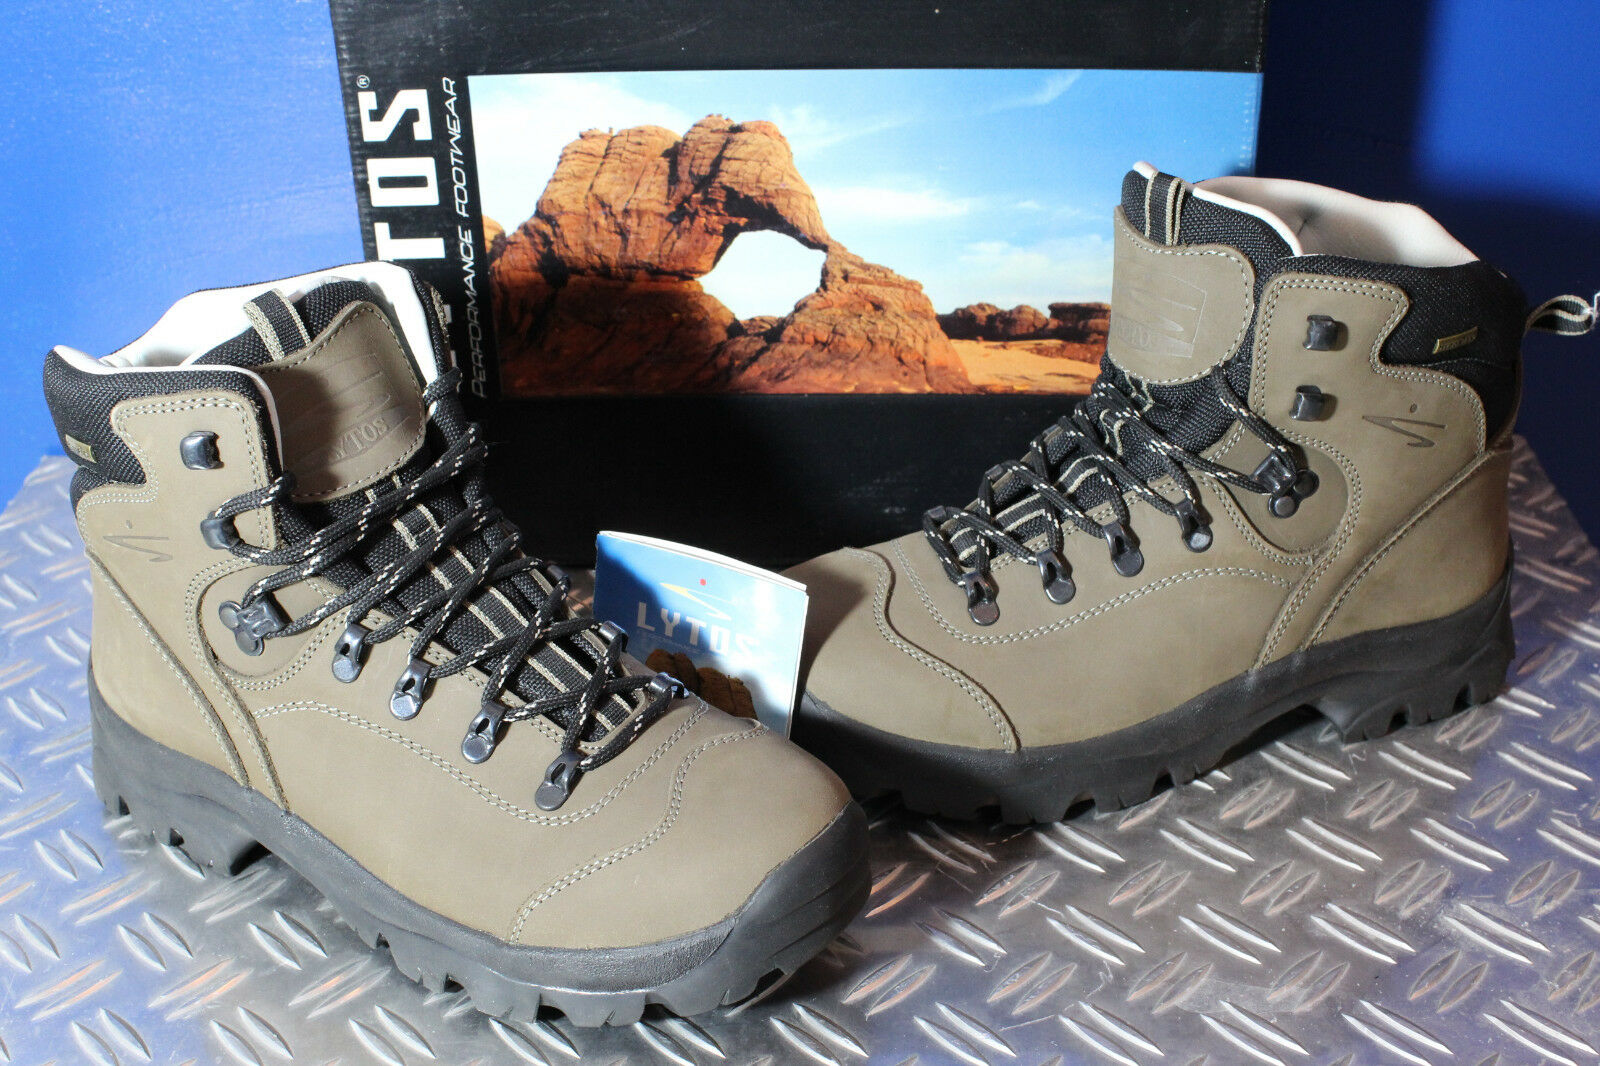 LYTOS Outdoor Wanderschuhe Trekking Schuhe Stiefel Schnürer Leder Textil braun 45  | Online Shop Europe